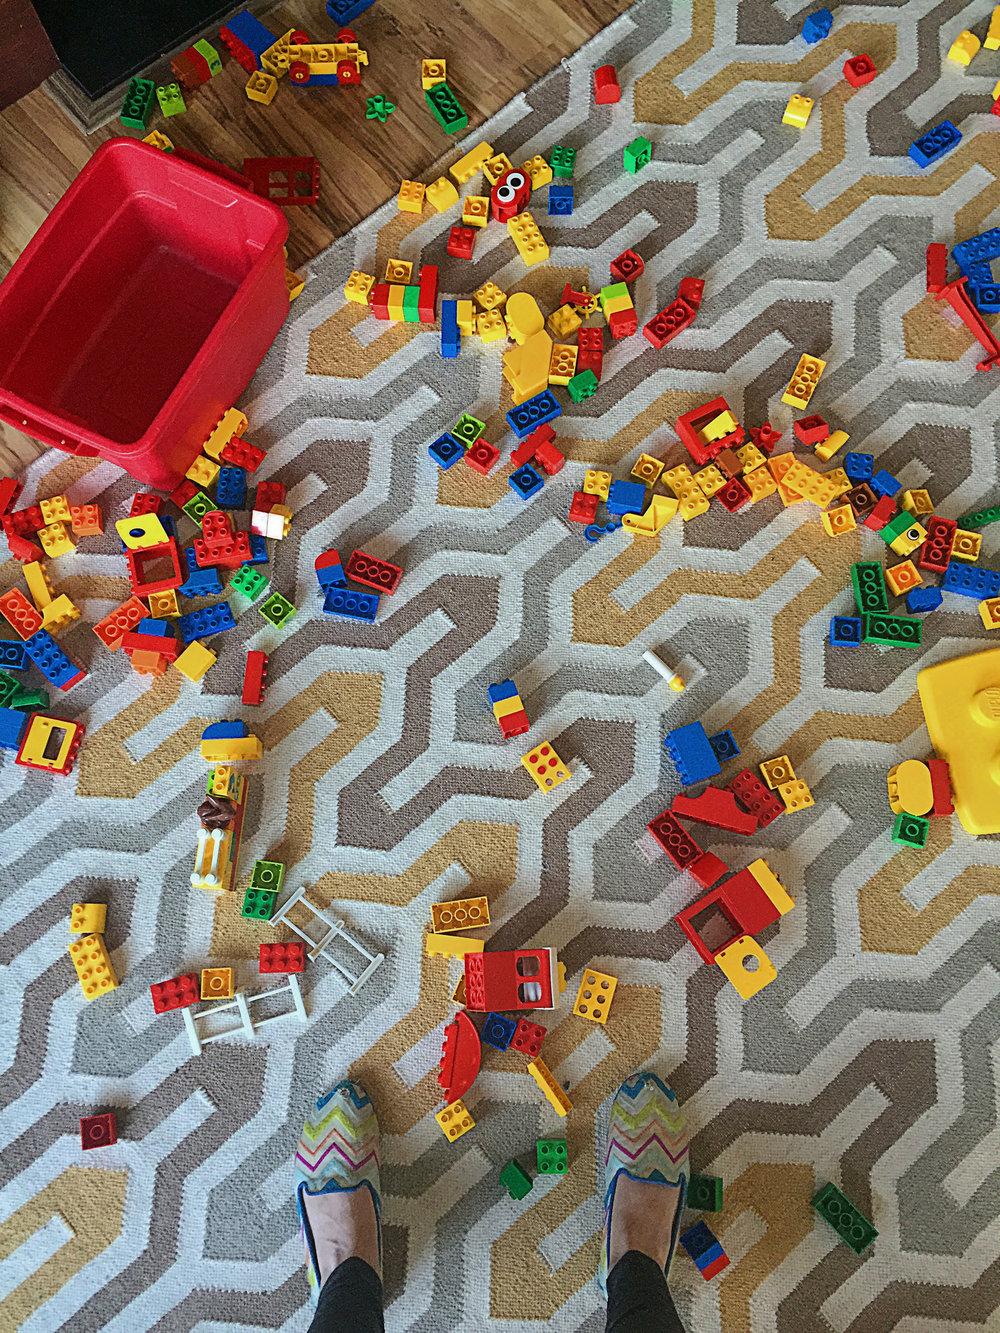 2017 01 05 Legos 01.jpg